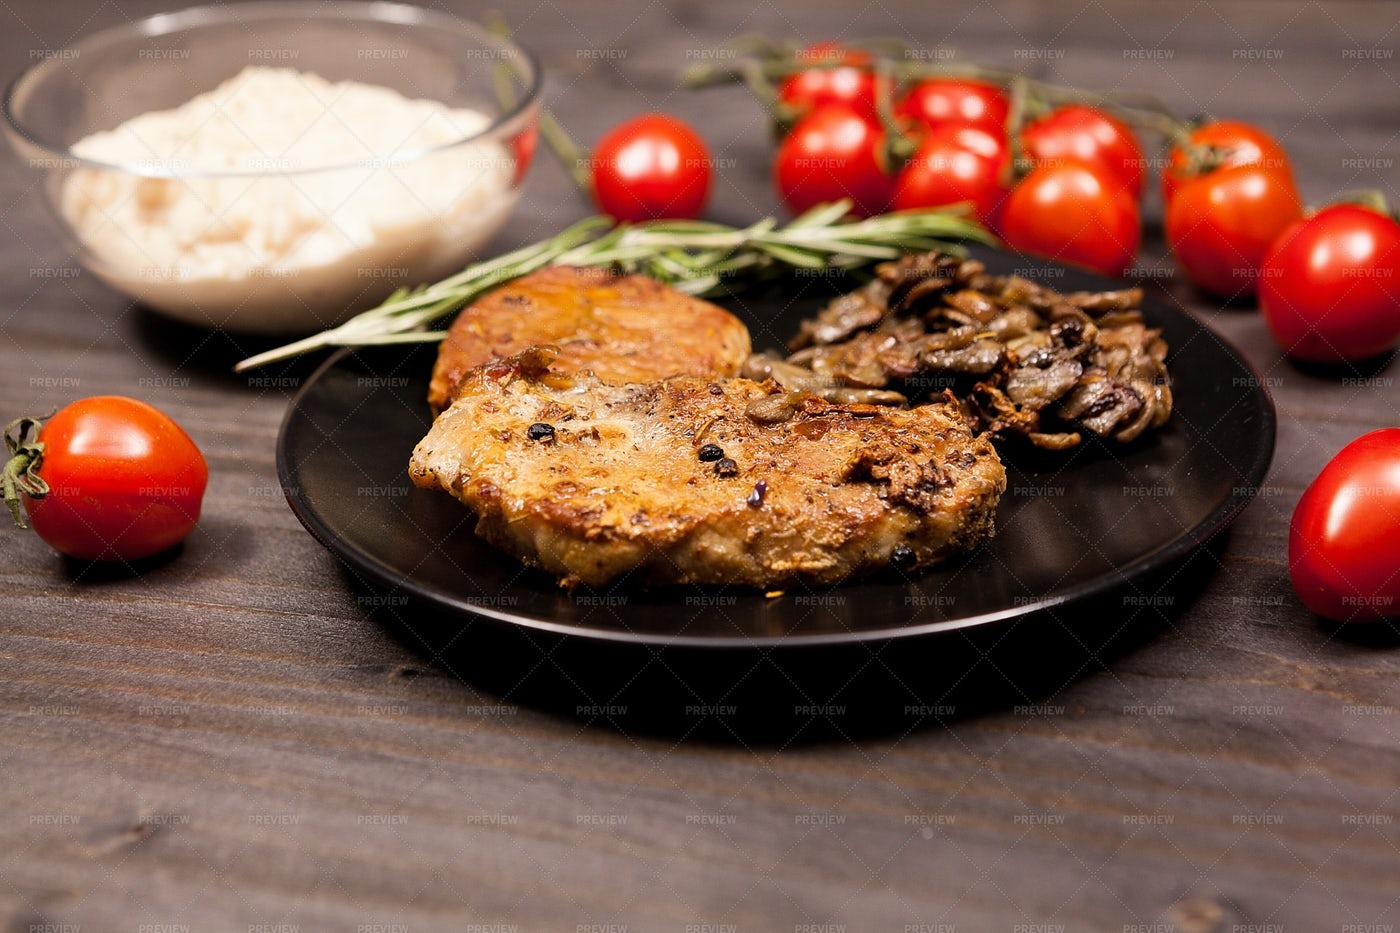 Mushroom And Pork Dinner: Stock Photos